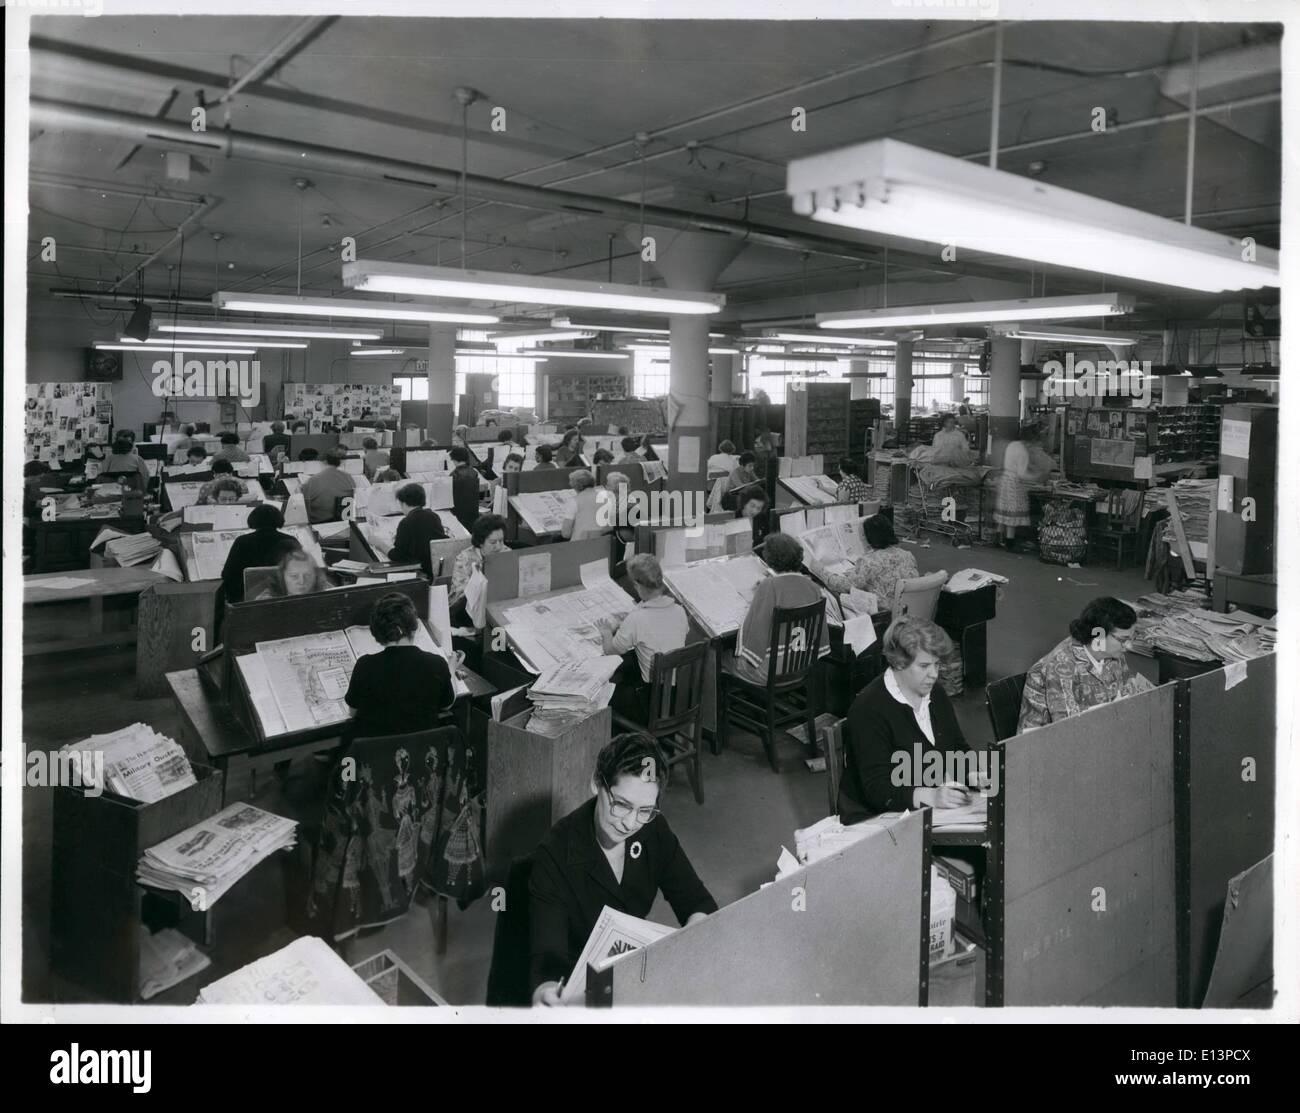 Mar. 22, 2012 - Romeike Press Clippings since 1881 - Staten Island, New York - Stock Image